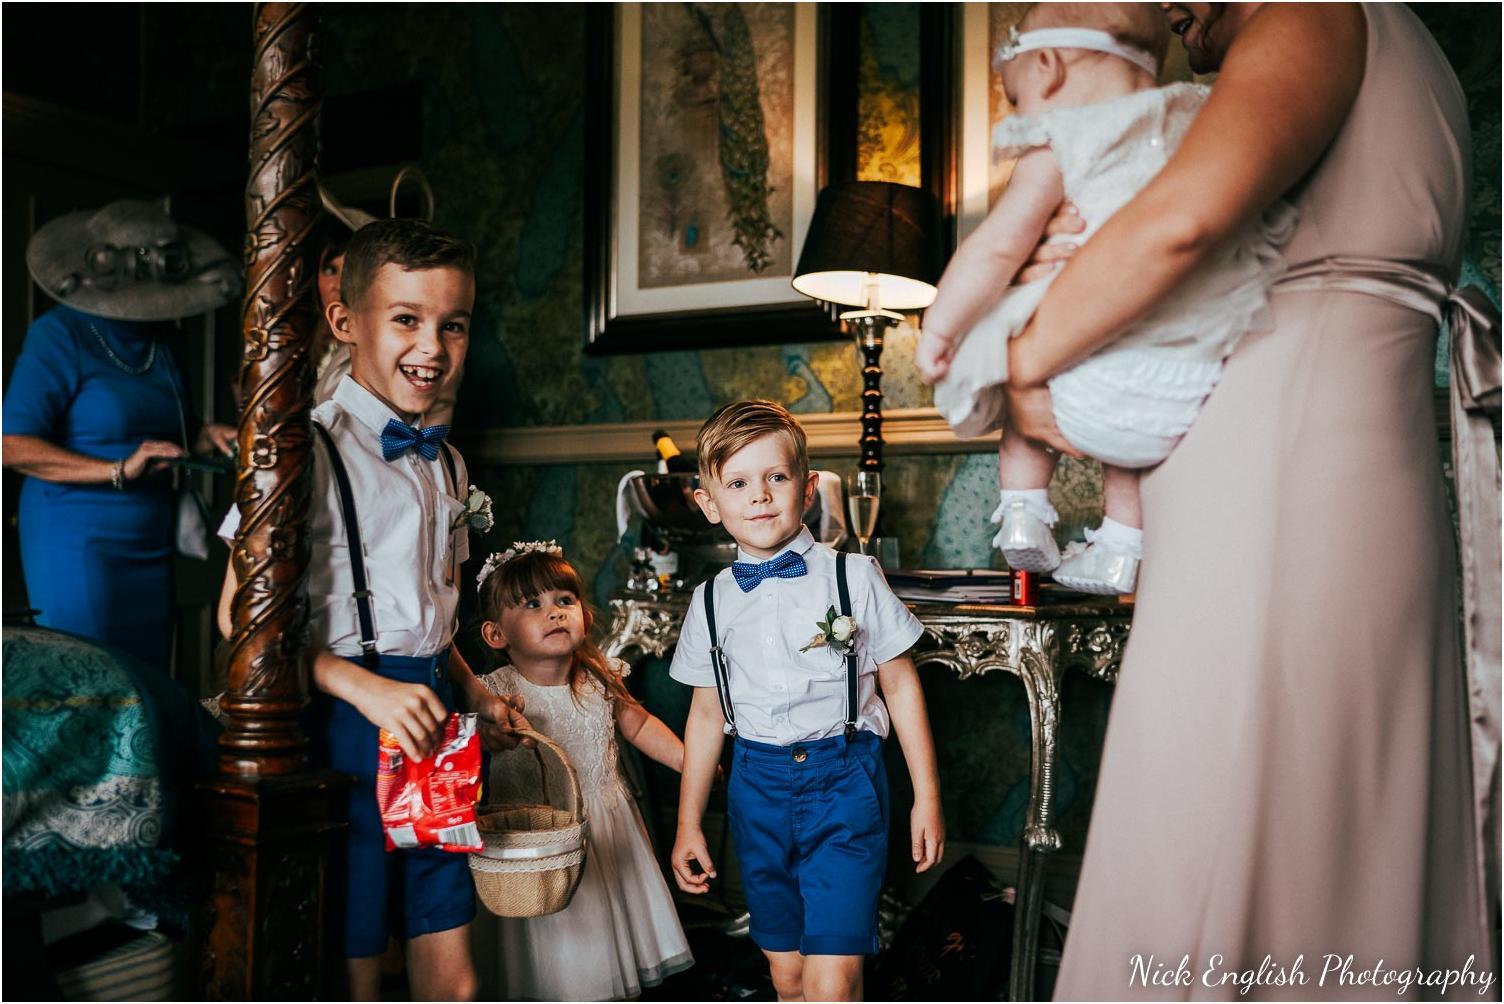 Mitton_Hall_Wedding_Summer_Photograph-35.jpg